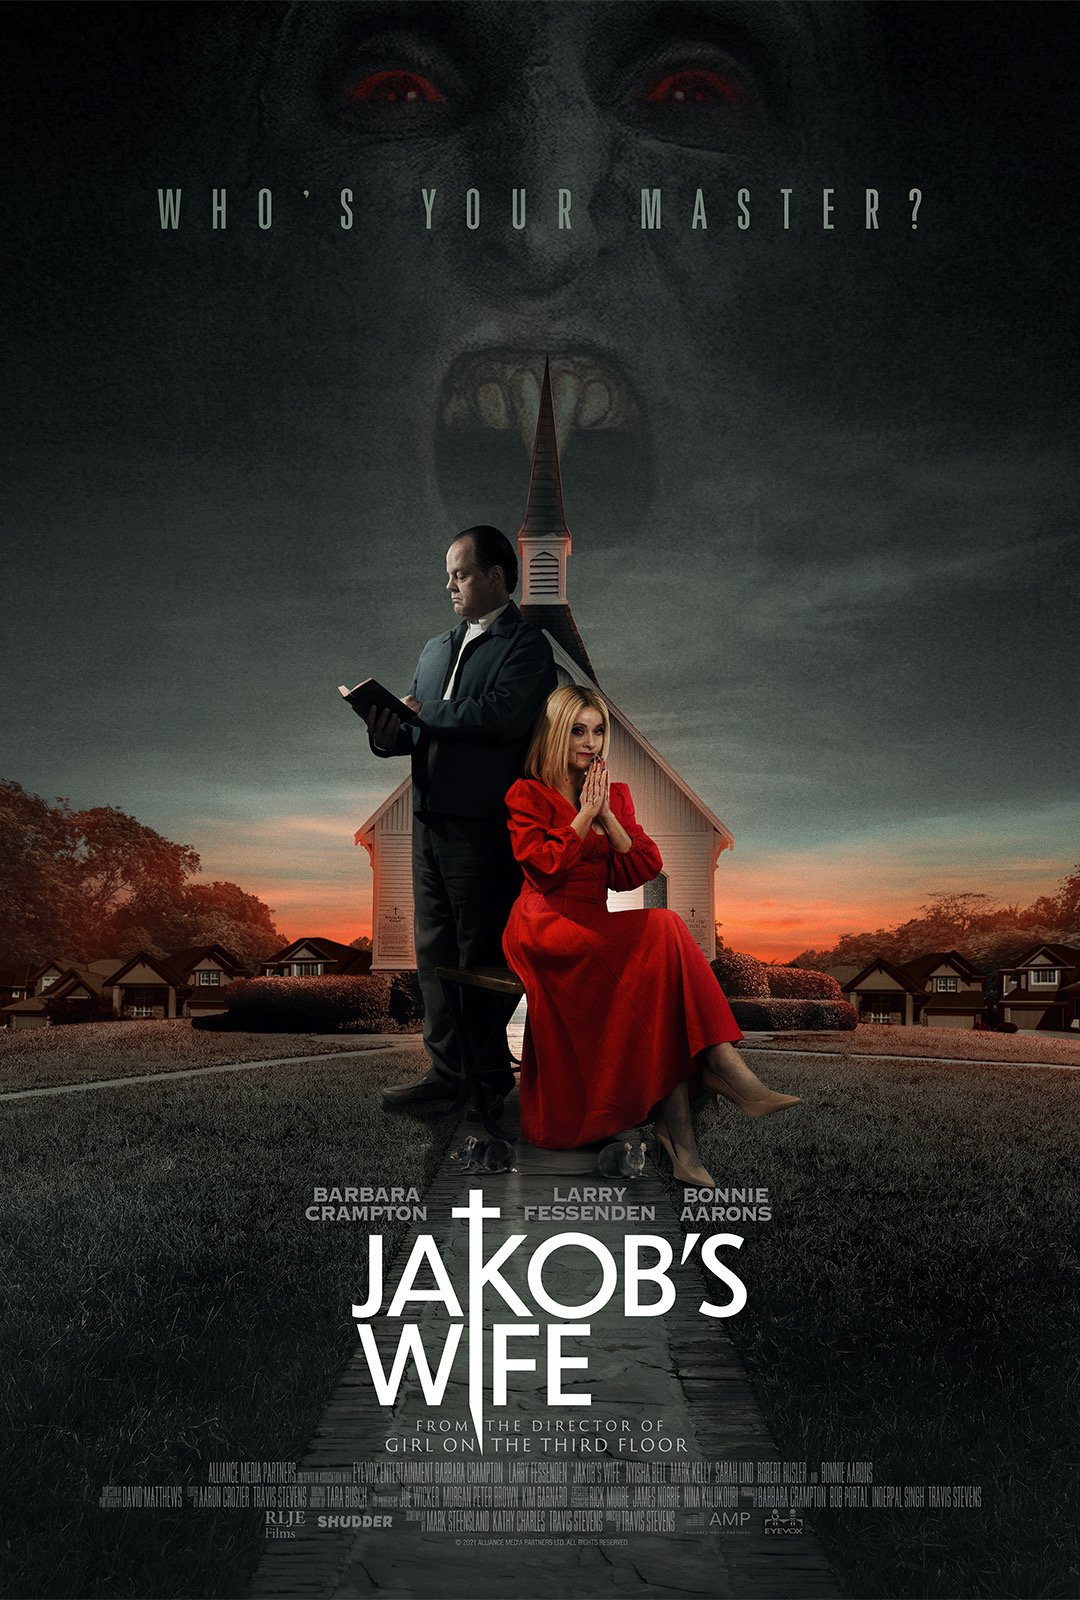 jakob's wife film poster